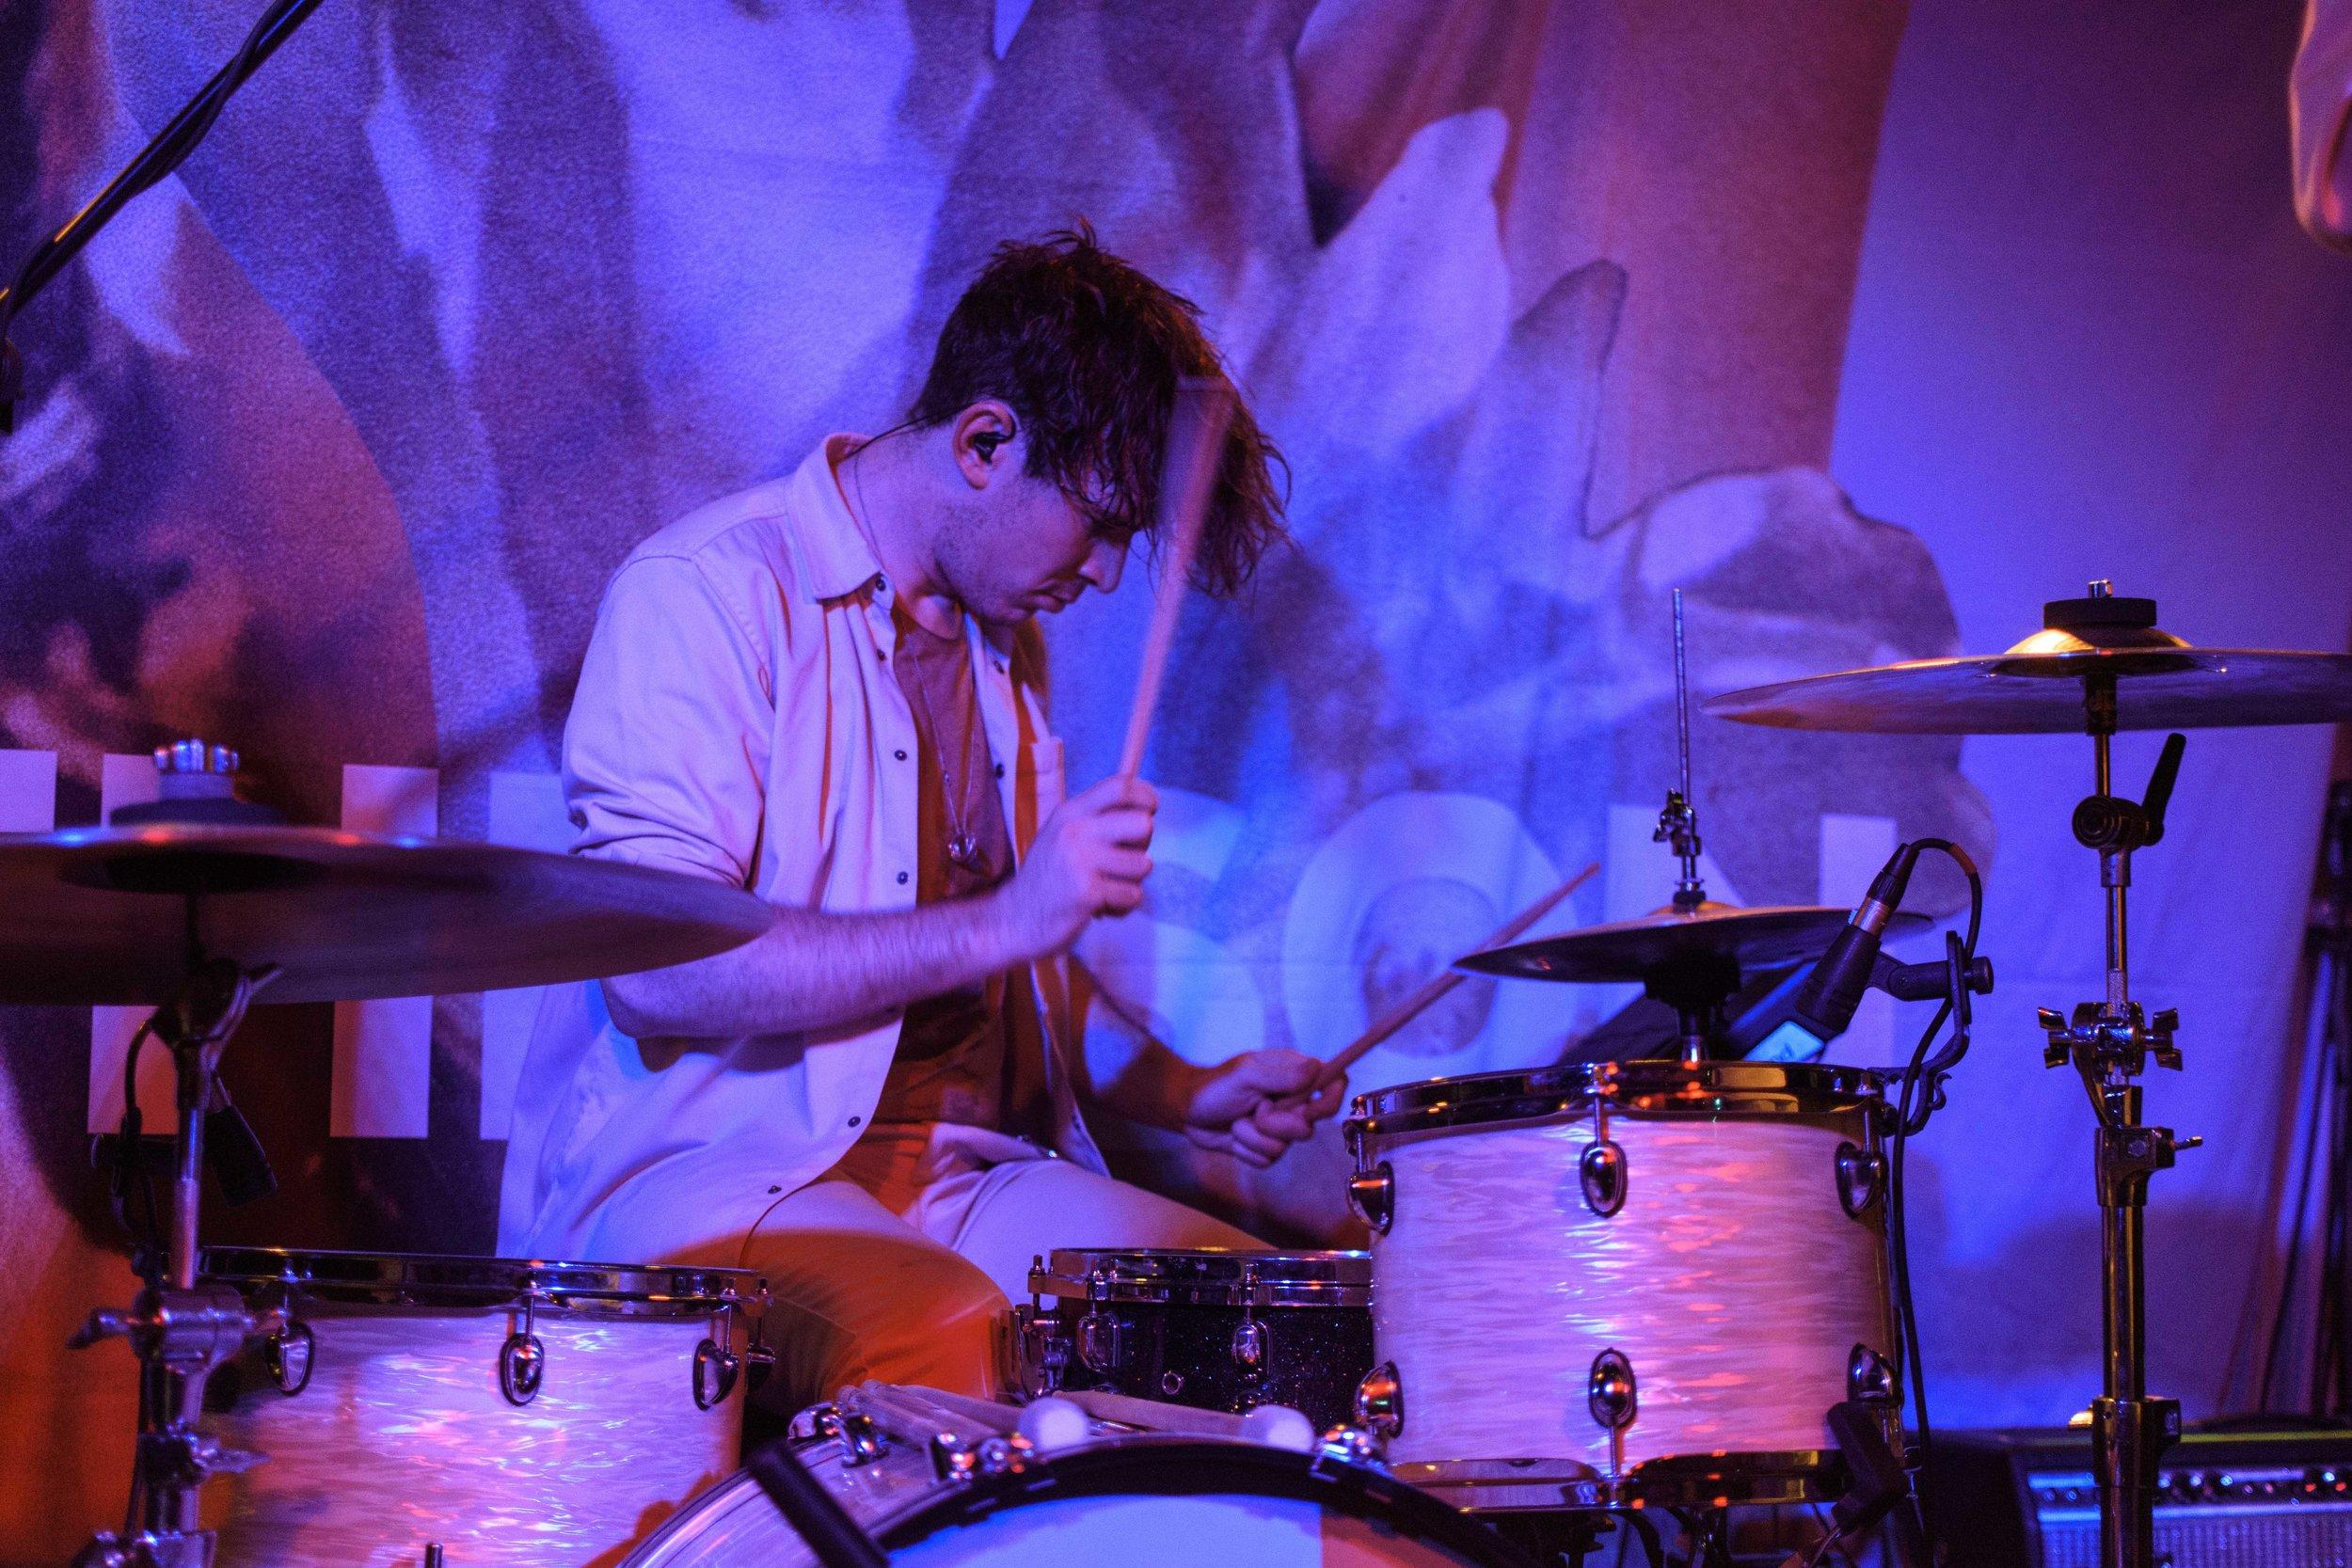 Fatherson - Sunflower Lounge - 06-10-2018 - Birmingham 7.jpg